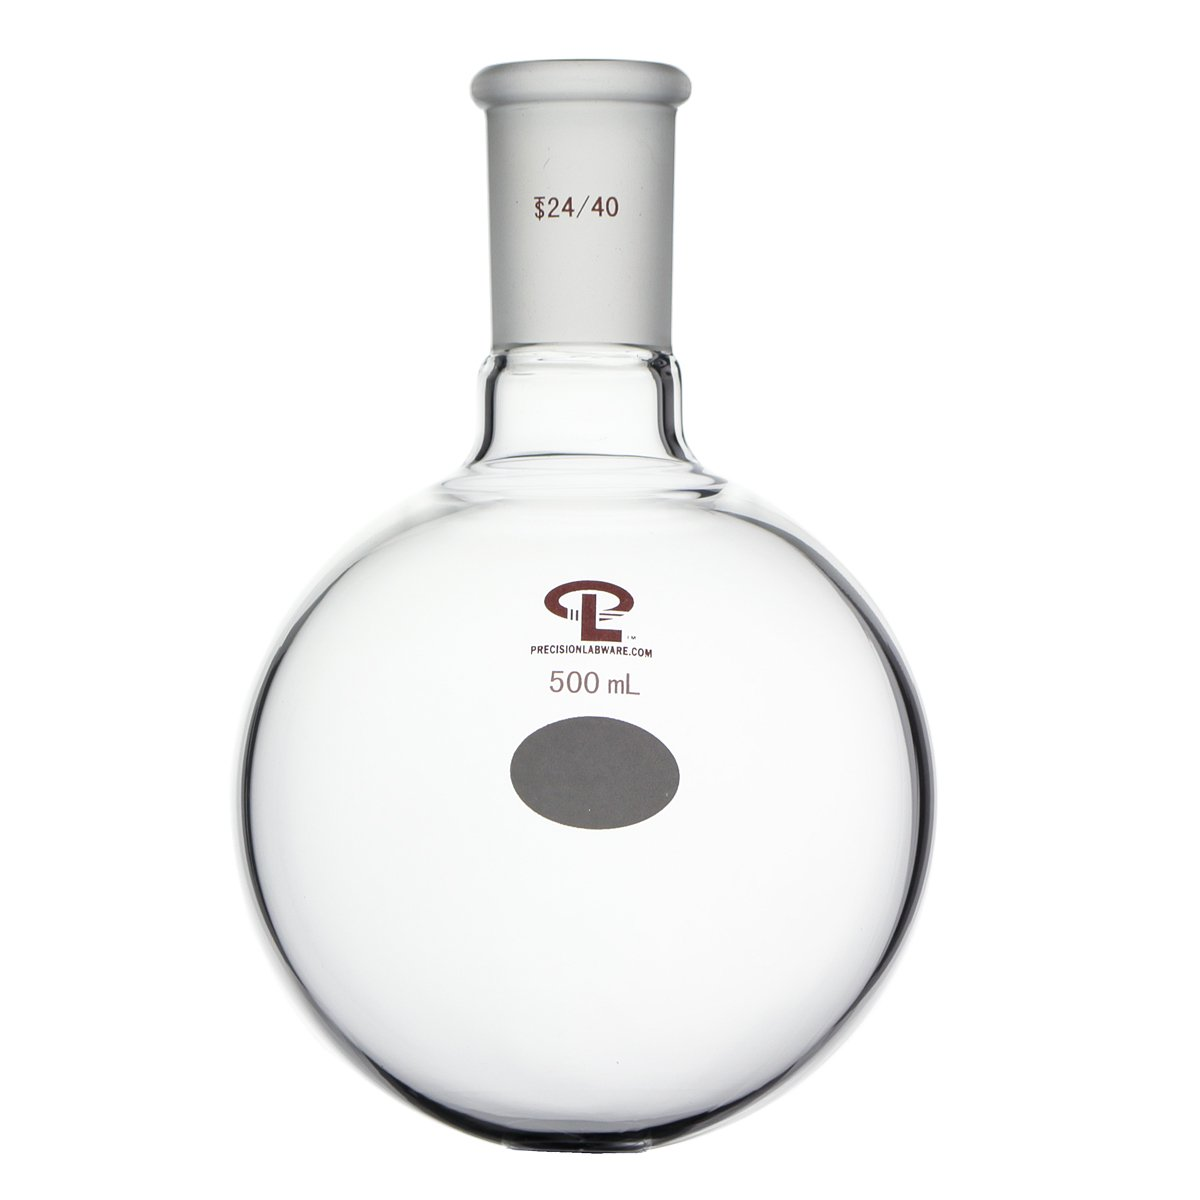 Precision 500mL 24/40 Single Neck Round Bottom Flask, Heavy Wall, Borosilicate Glass